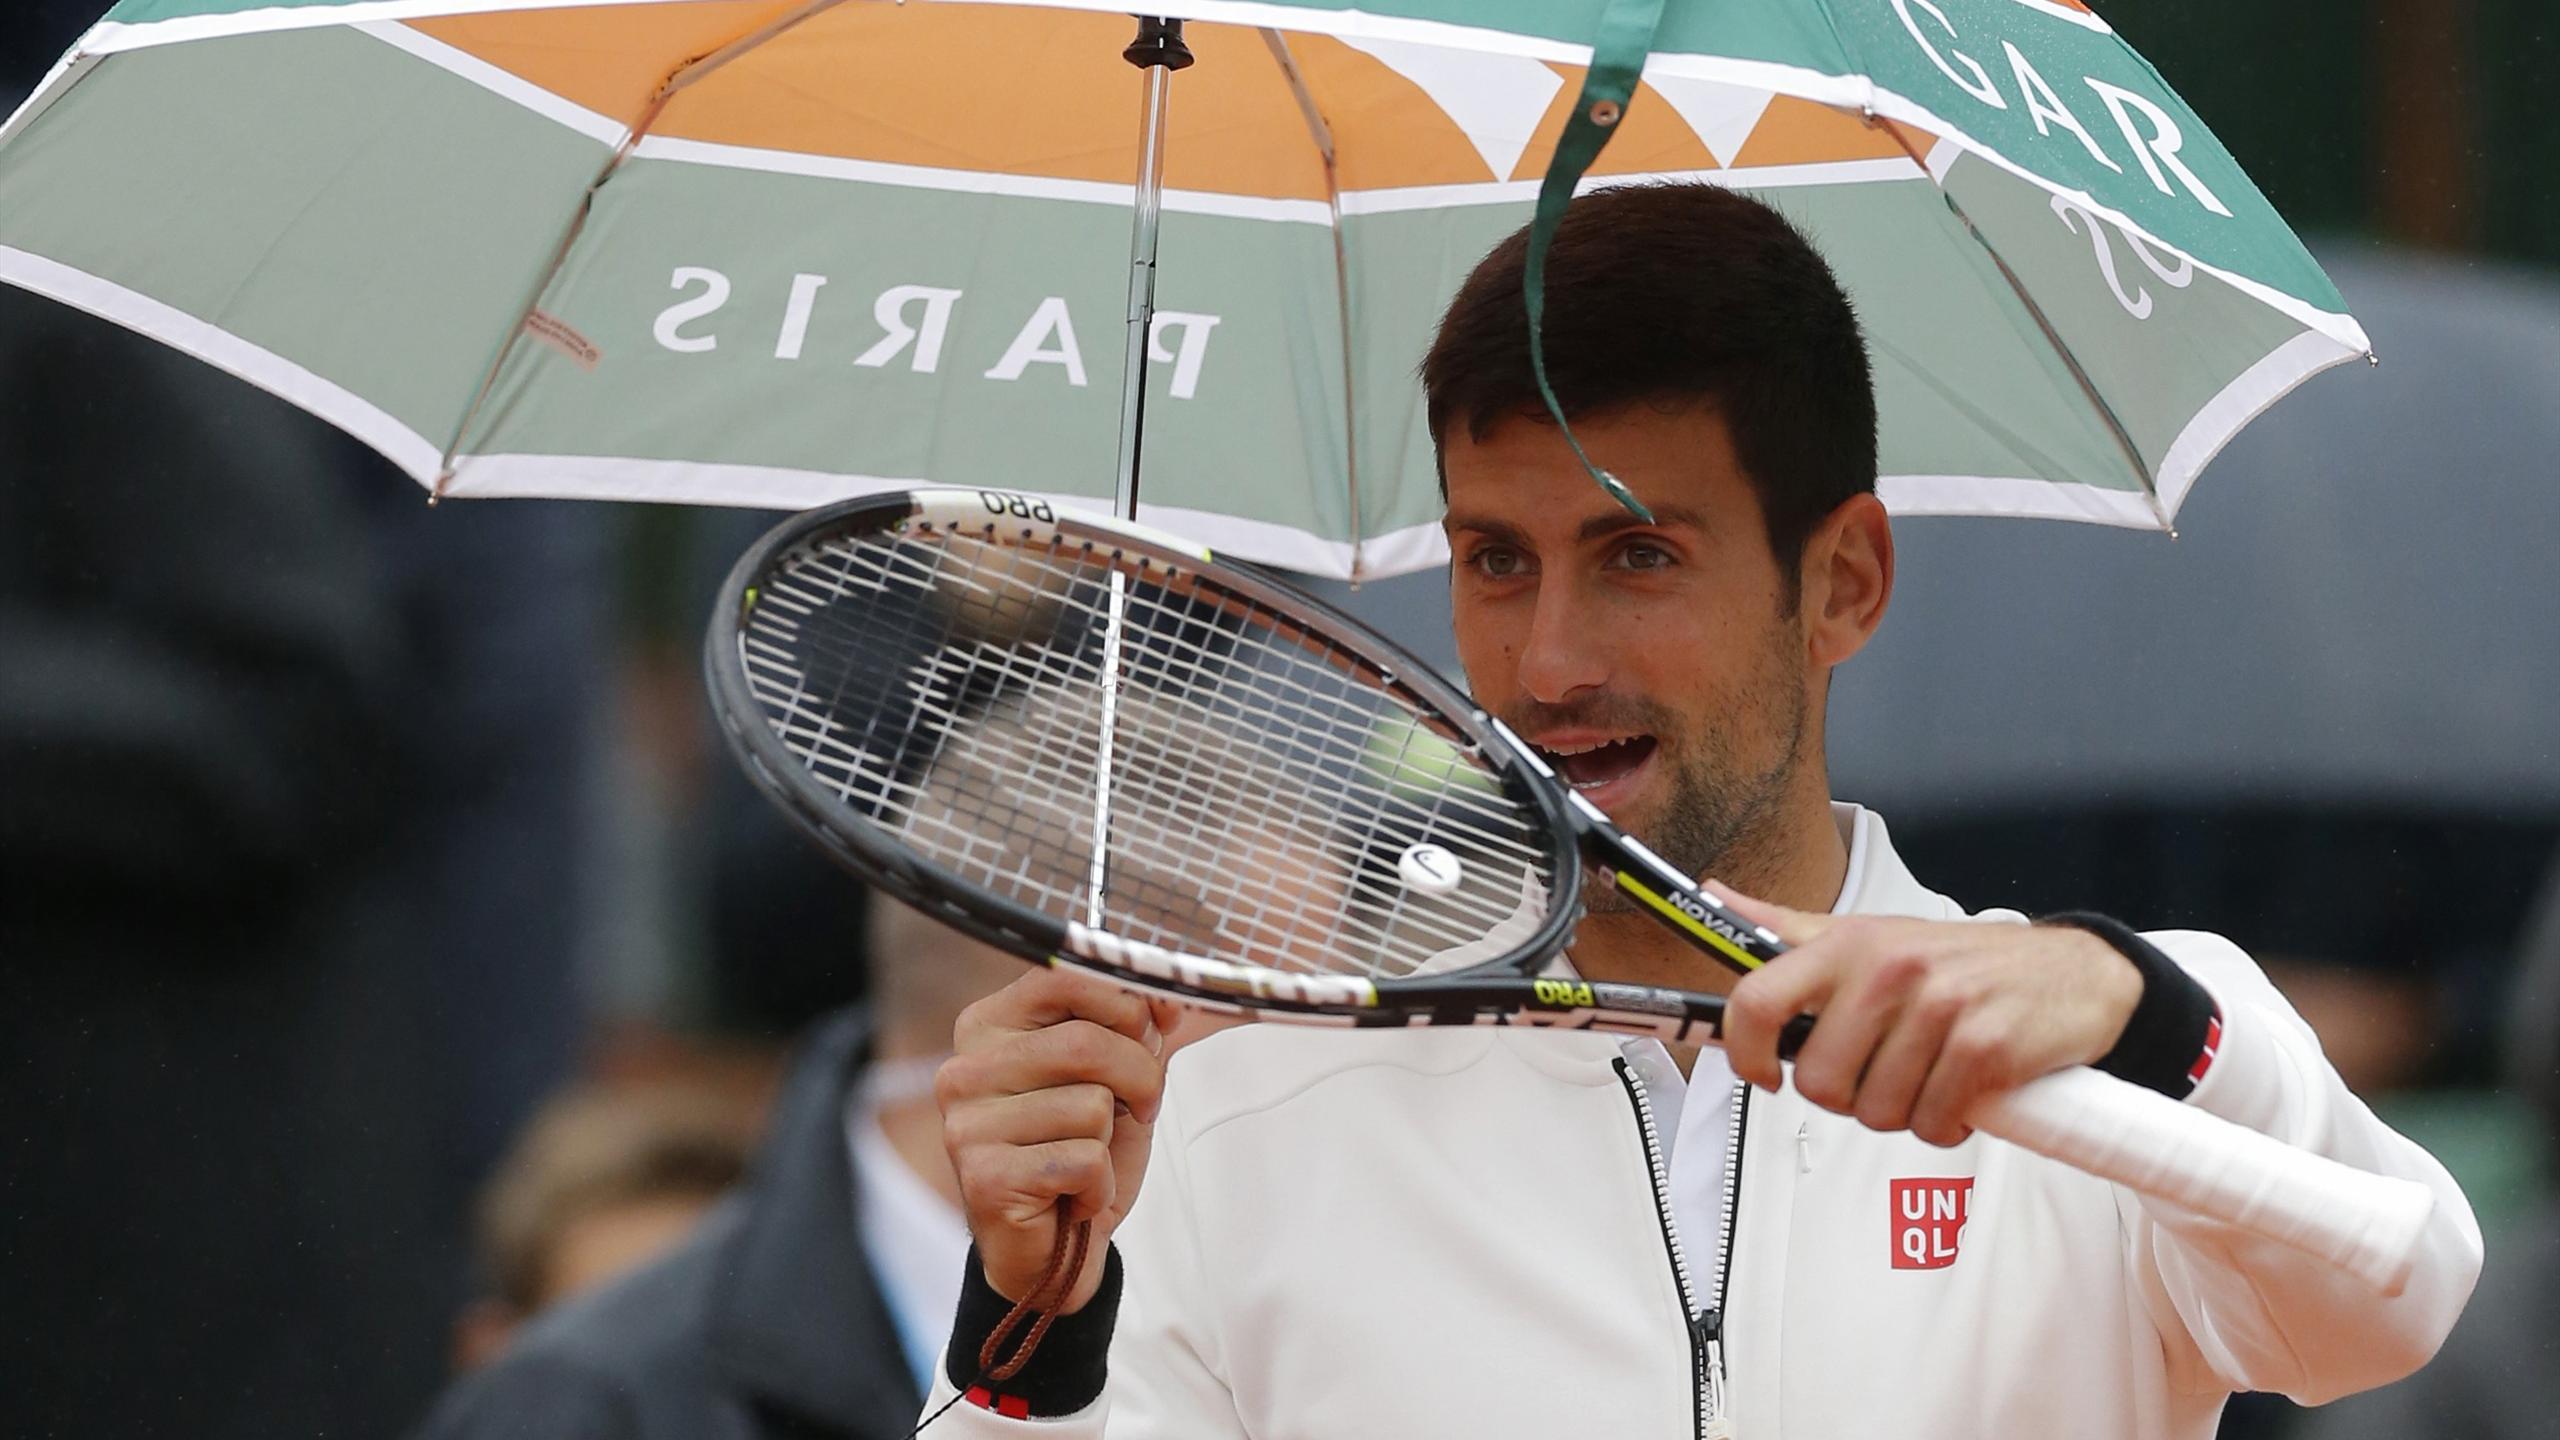 Novak Djokovic holds an umbrella as he arrives on the court.